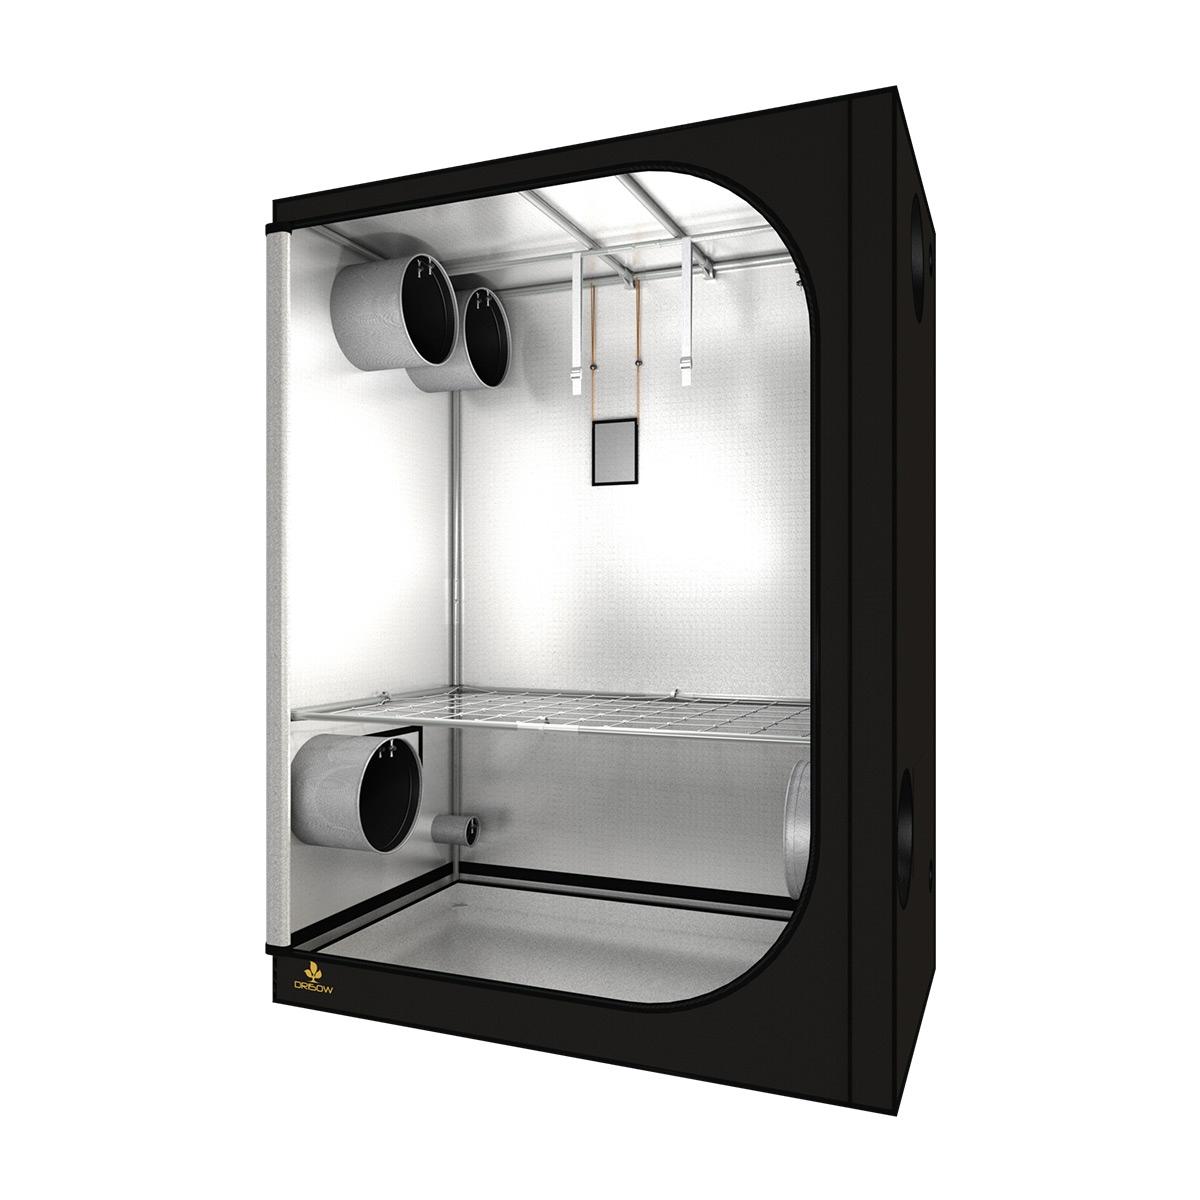 darkroom wide 150 x 90 x 200 cm secret jardin m2 de culture int rieur. Black Bedroom Furniture Sets. Home Design Ideas